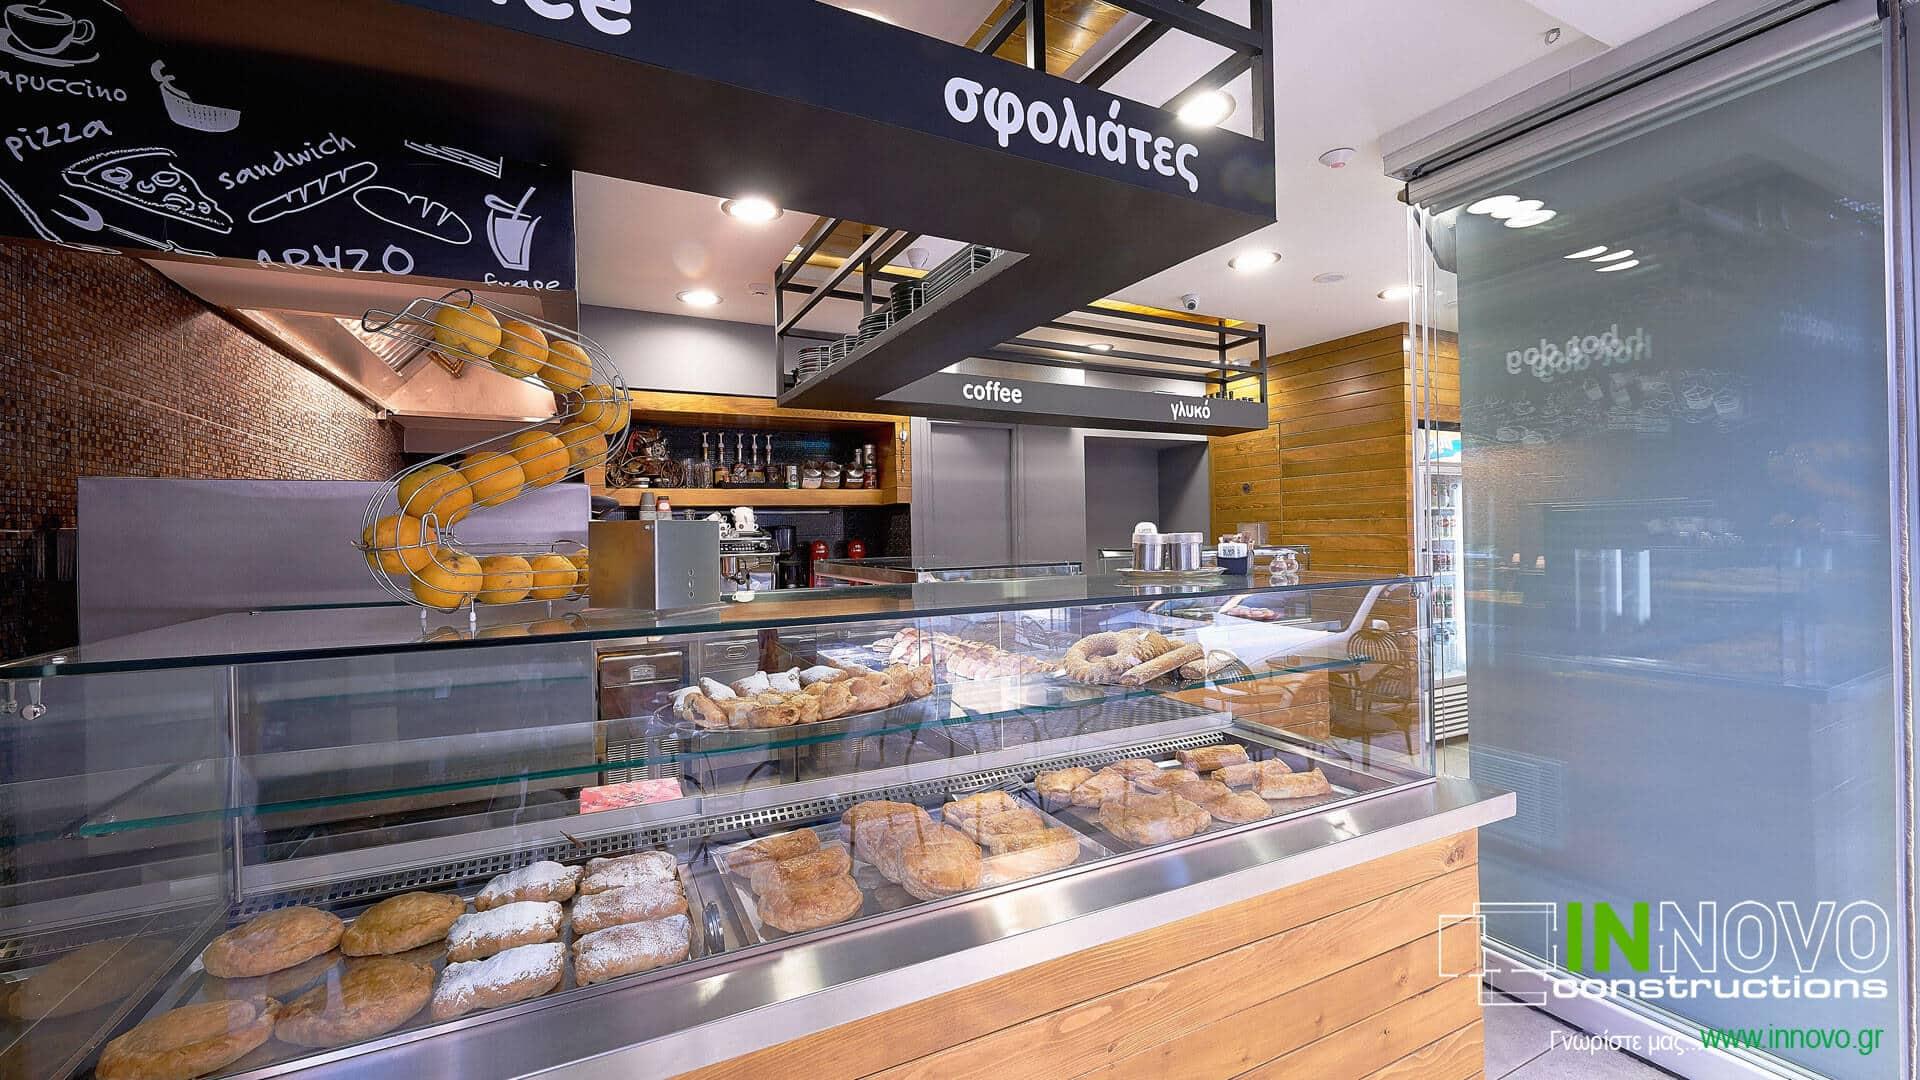 anakainisi-snack-cafe-renovation-snack-cafe-peiraias-1545-16